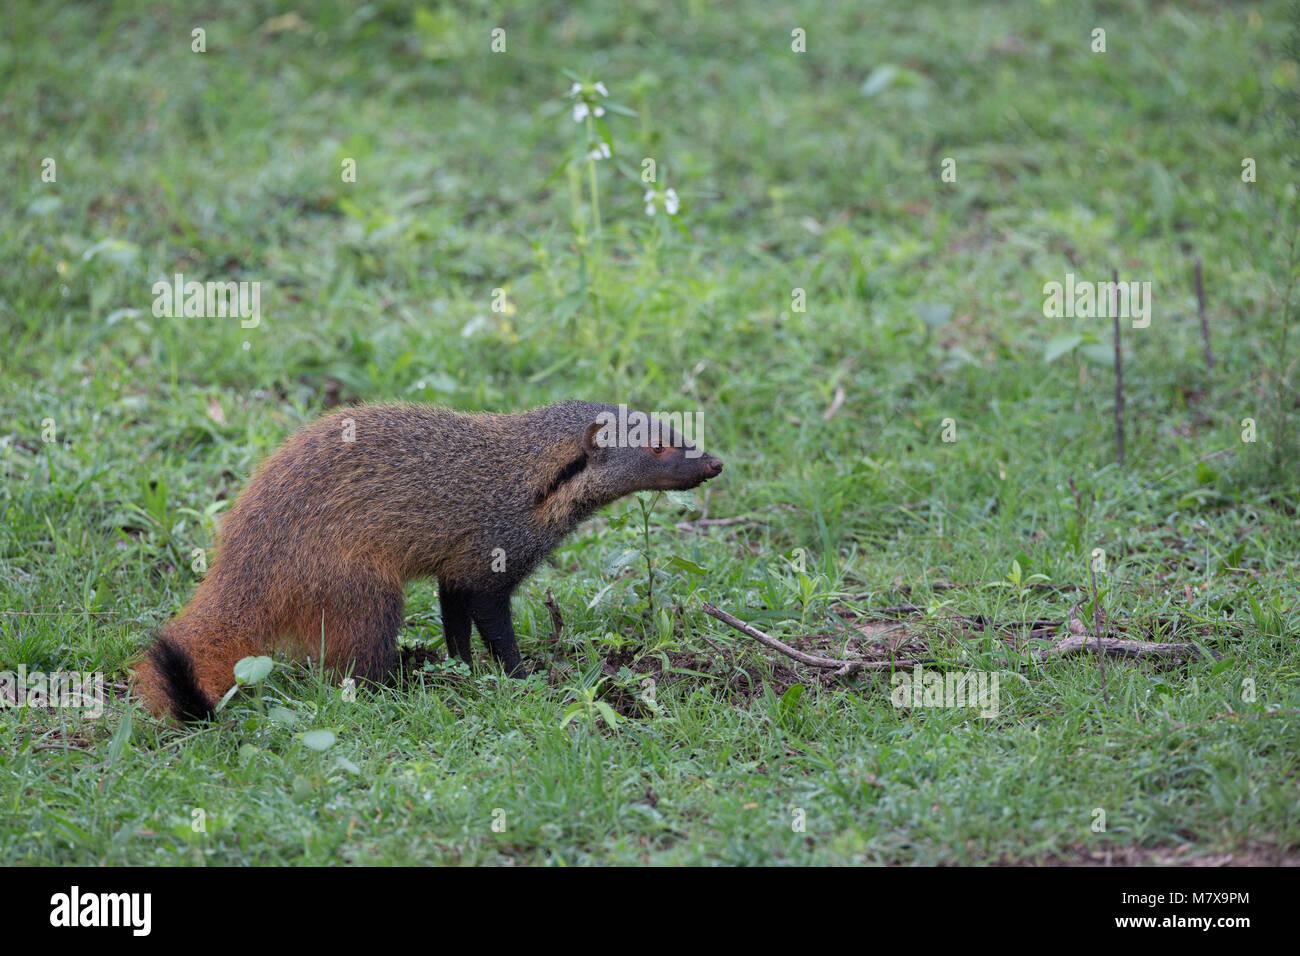 Stripe-necked mongoose - Stock Image